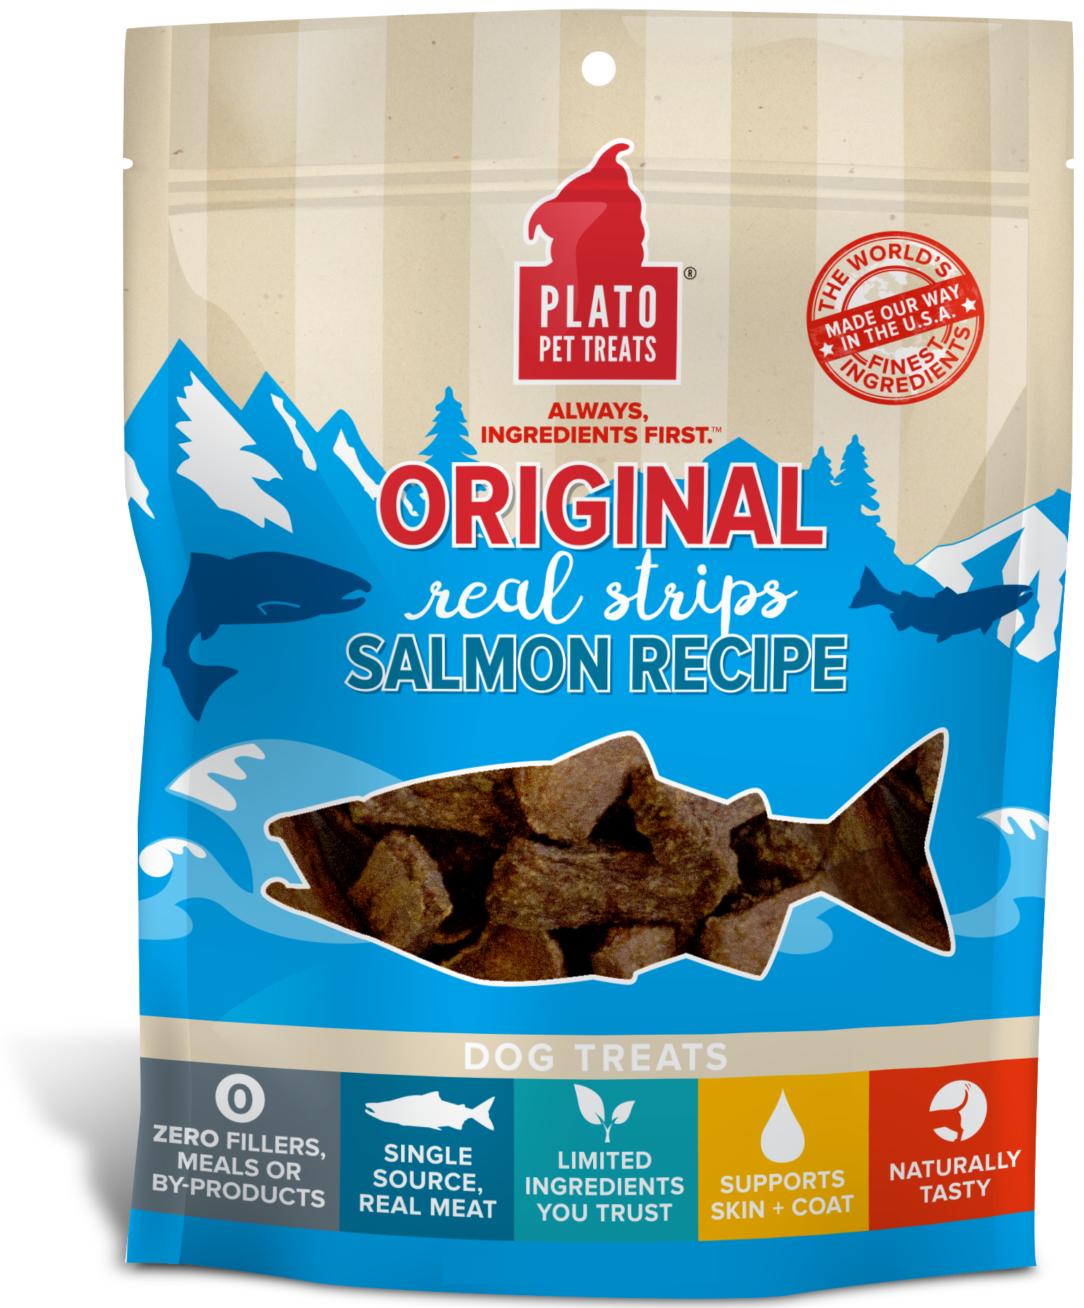 Plato Original Real Strips Salmon Recipe Dog Treat Image